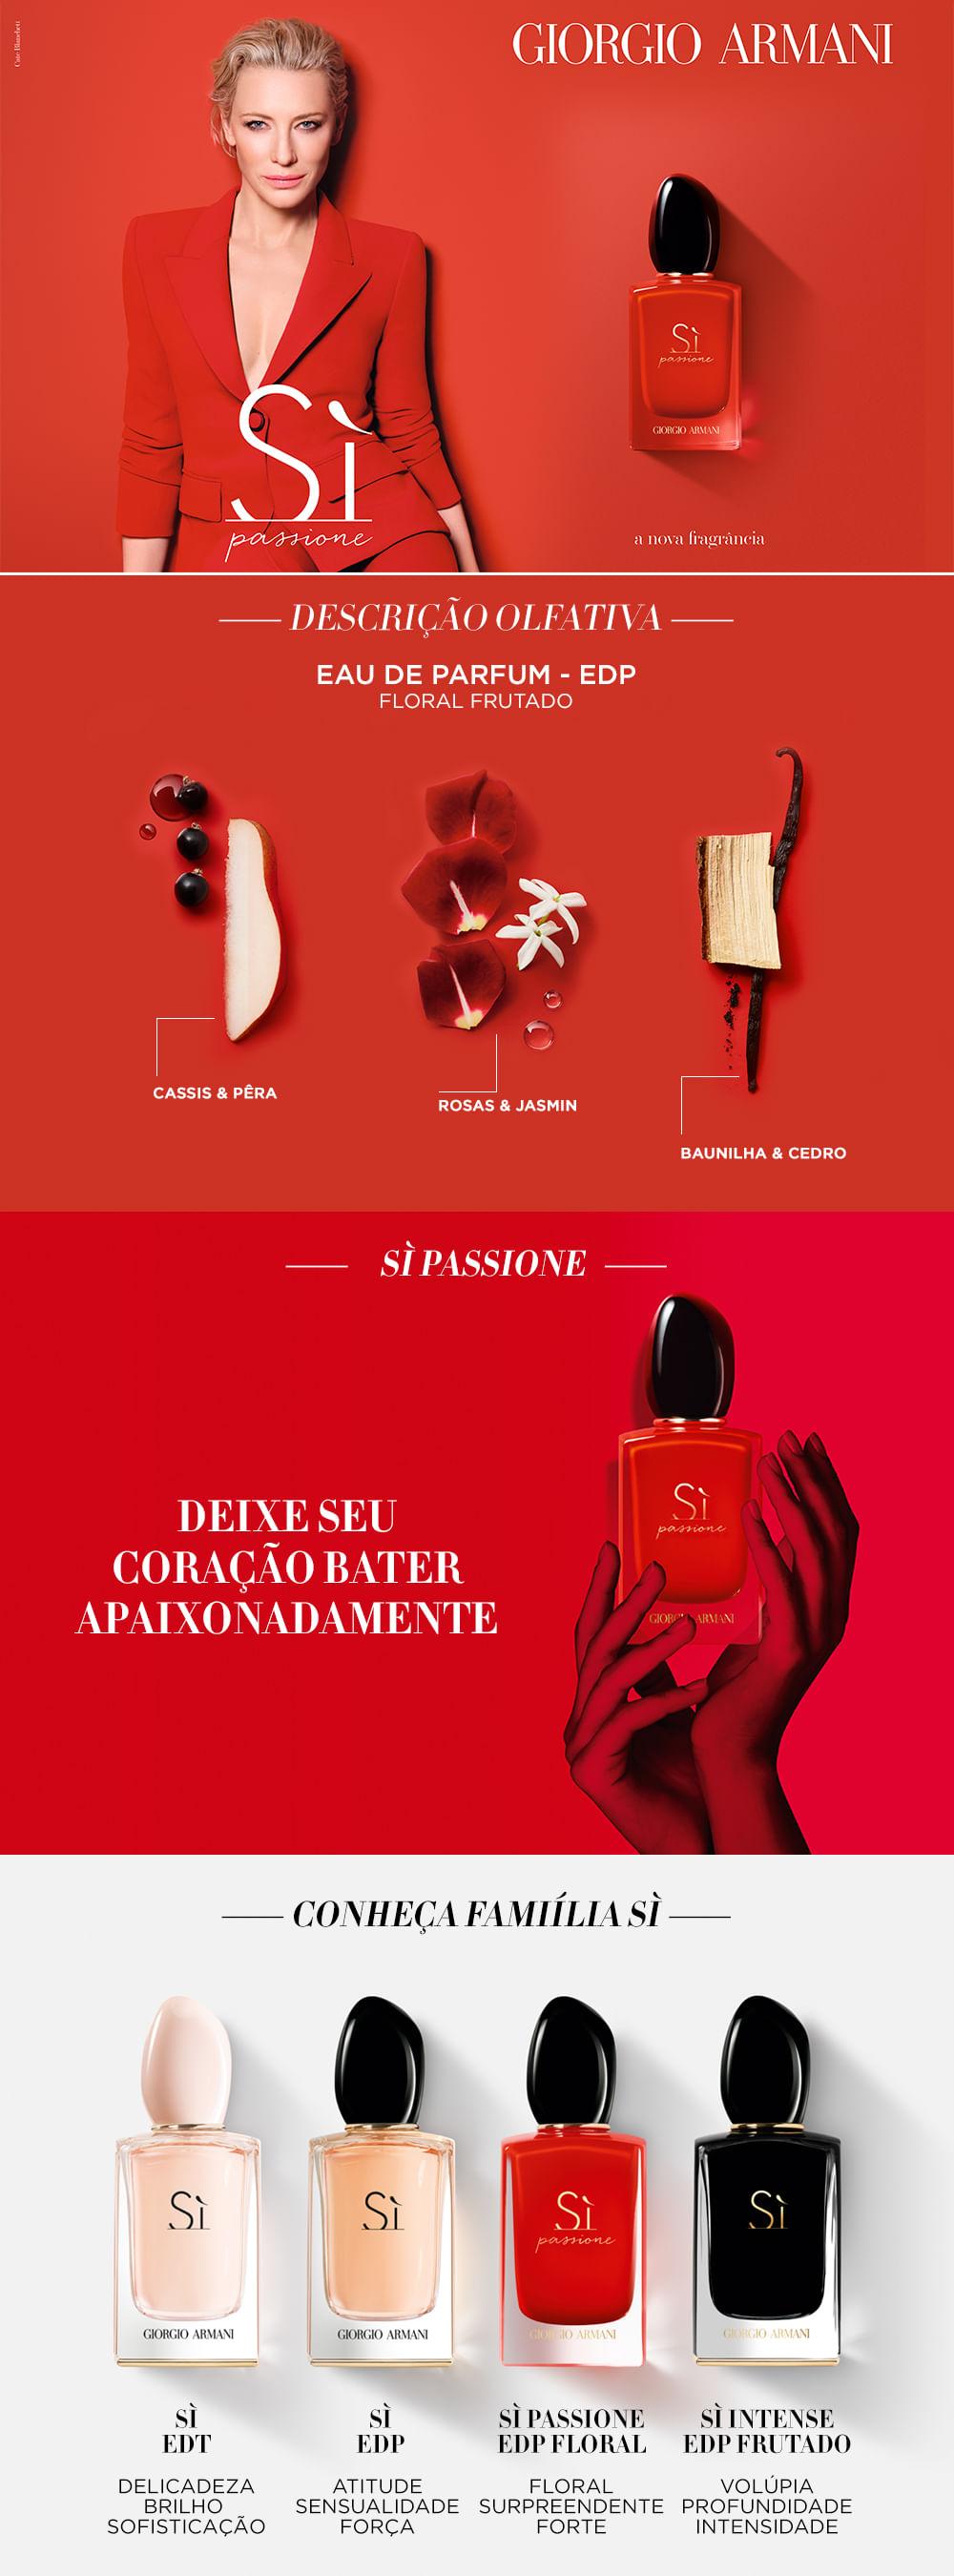 Sì Passione Giorgio Armani Perfume Feminino - Eau de Parfum